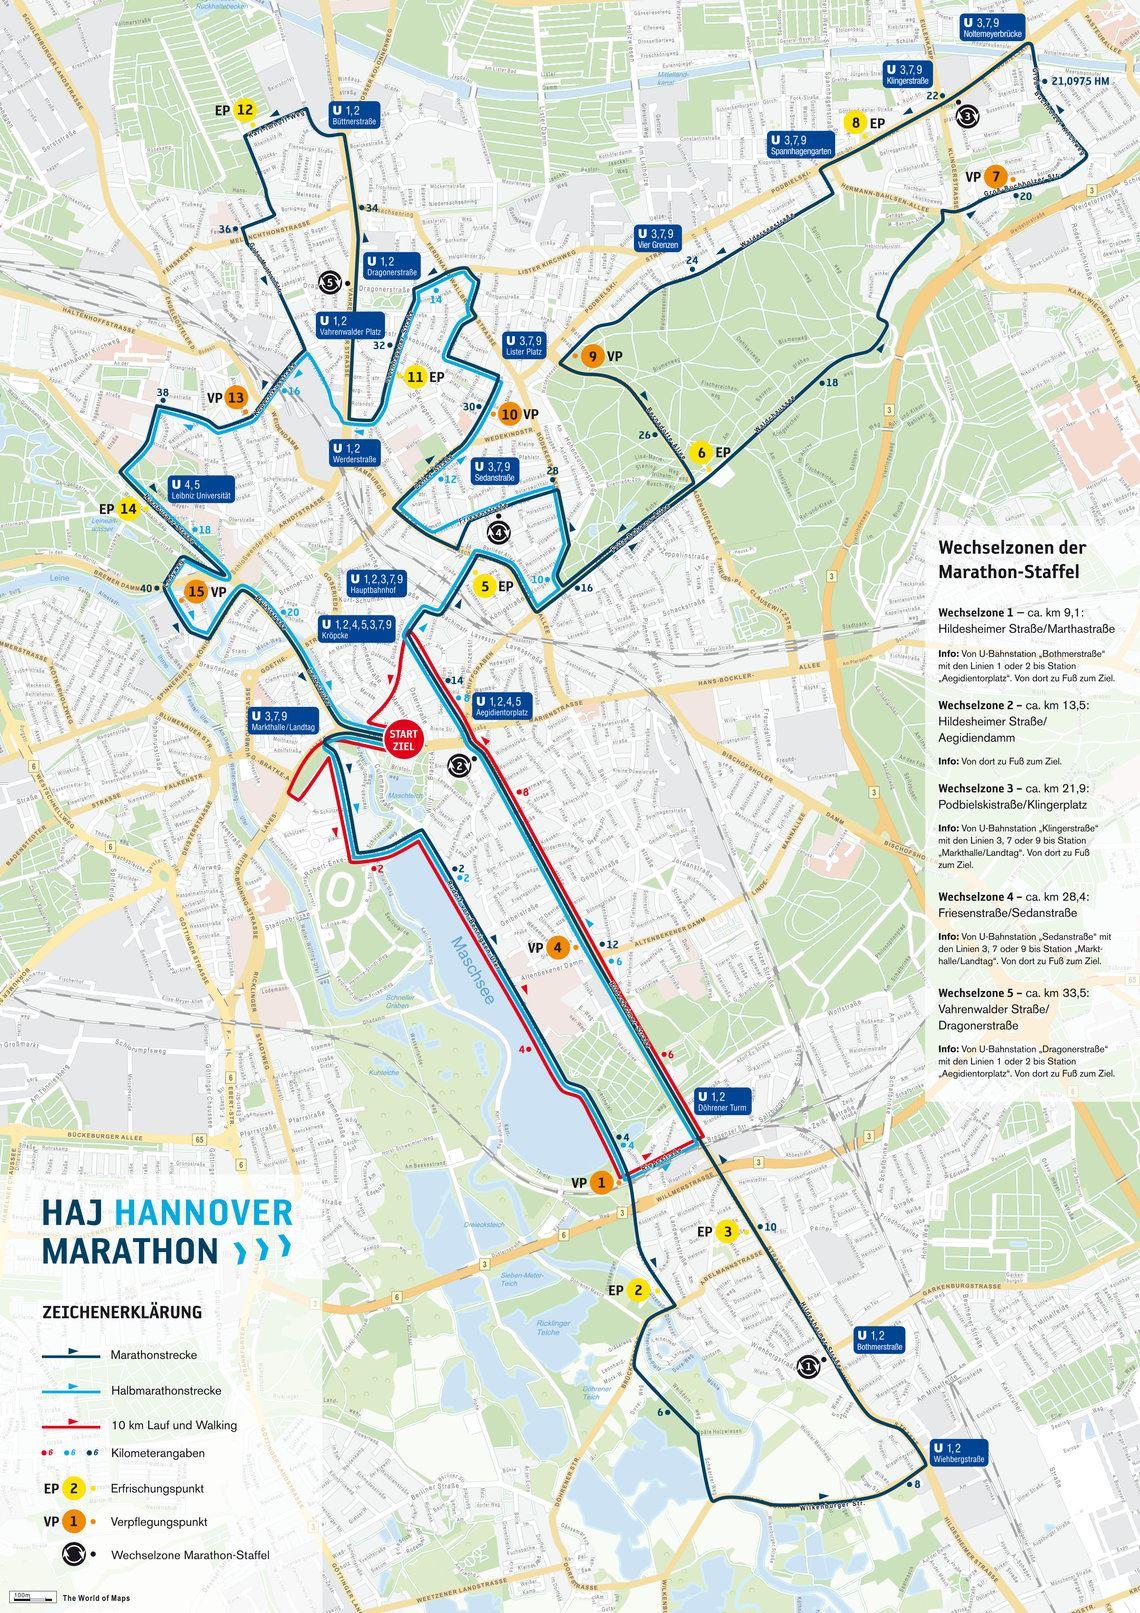 HAJ Hannover Marathon Route Map